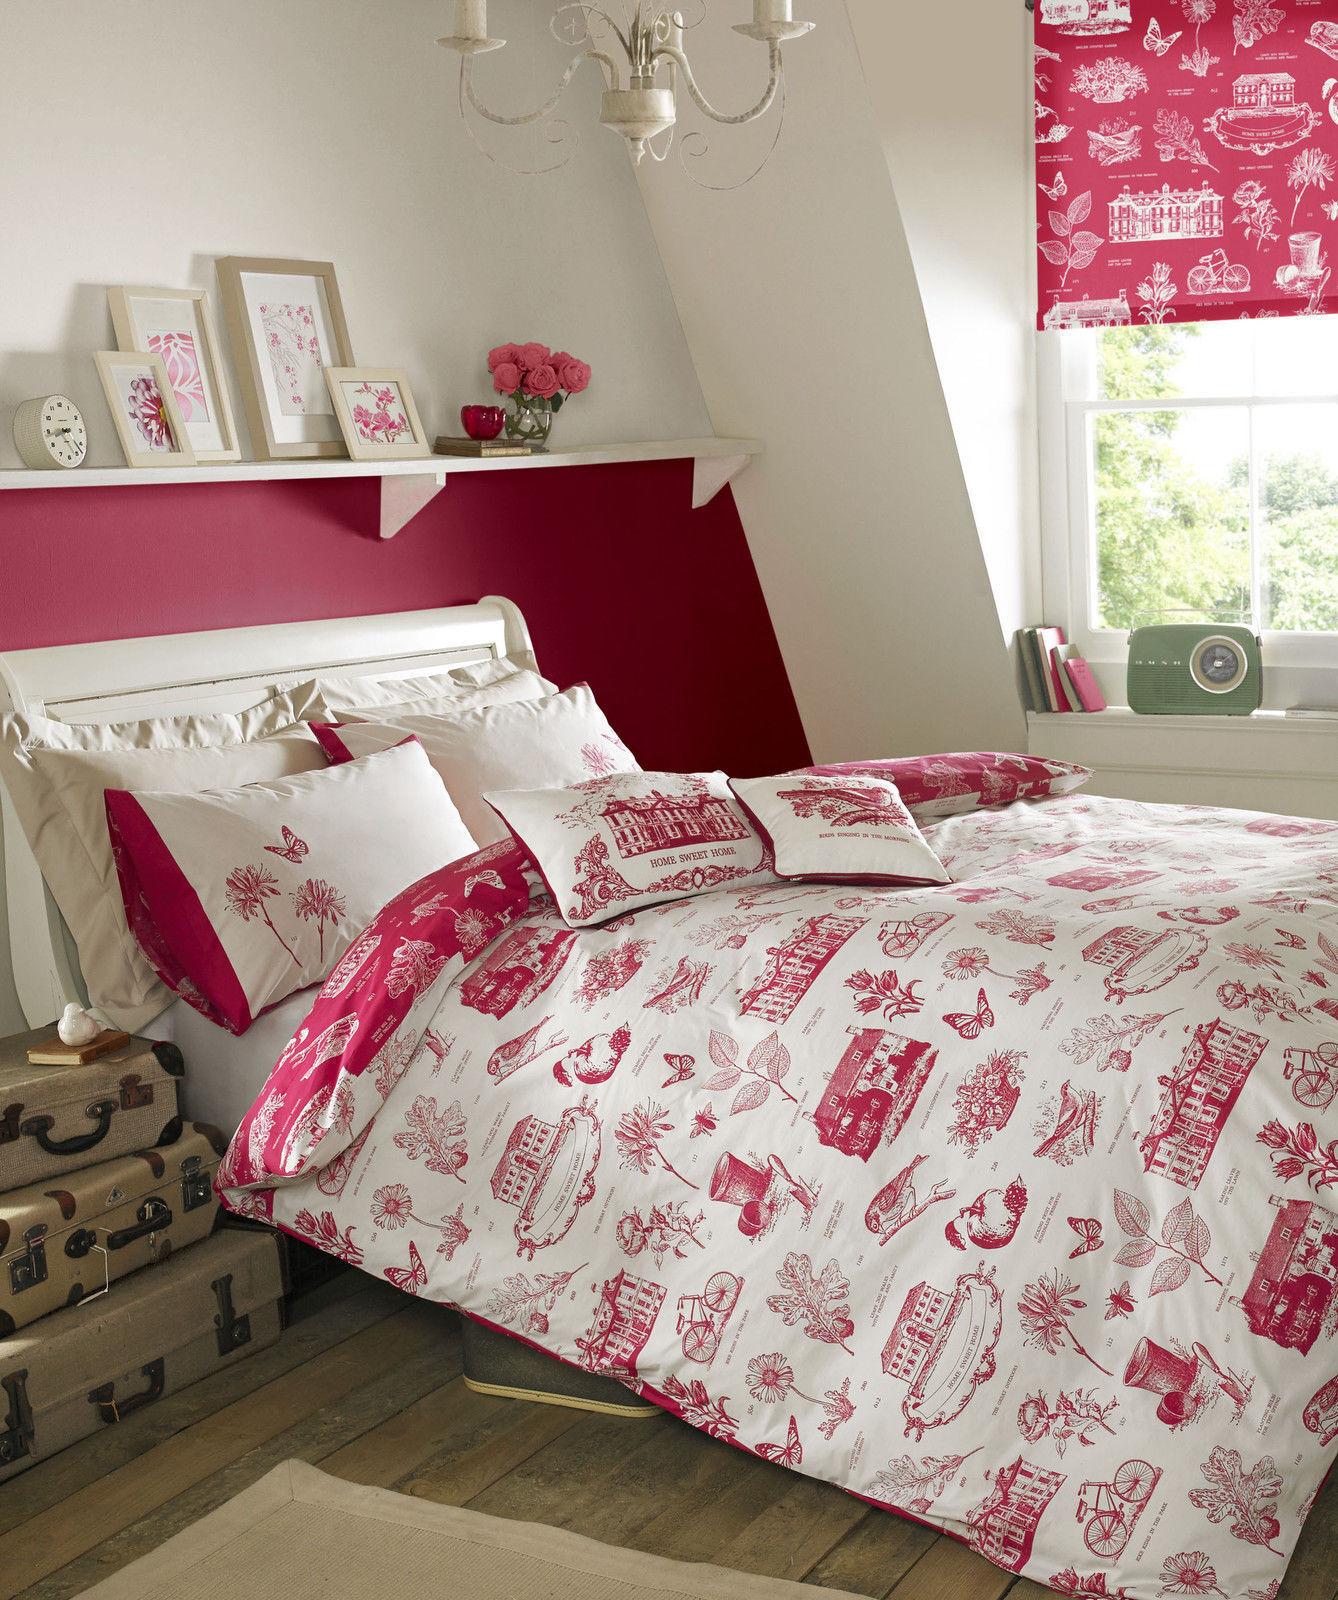 Harriet Raspberry Bedlinen by Kirstie Allsopp..Lowest Price + Free&Fast Delivery